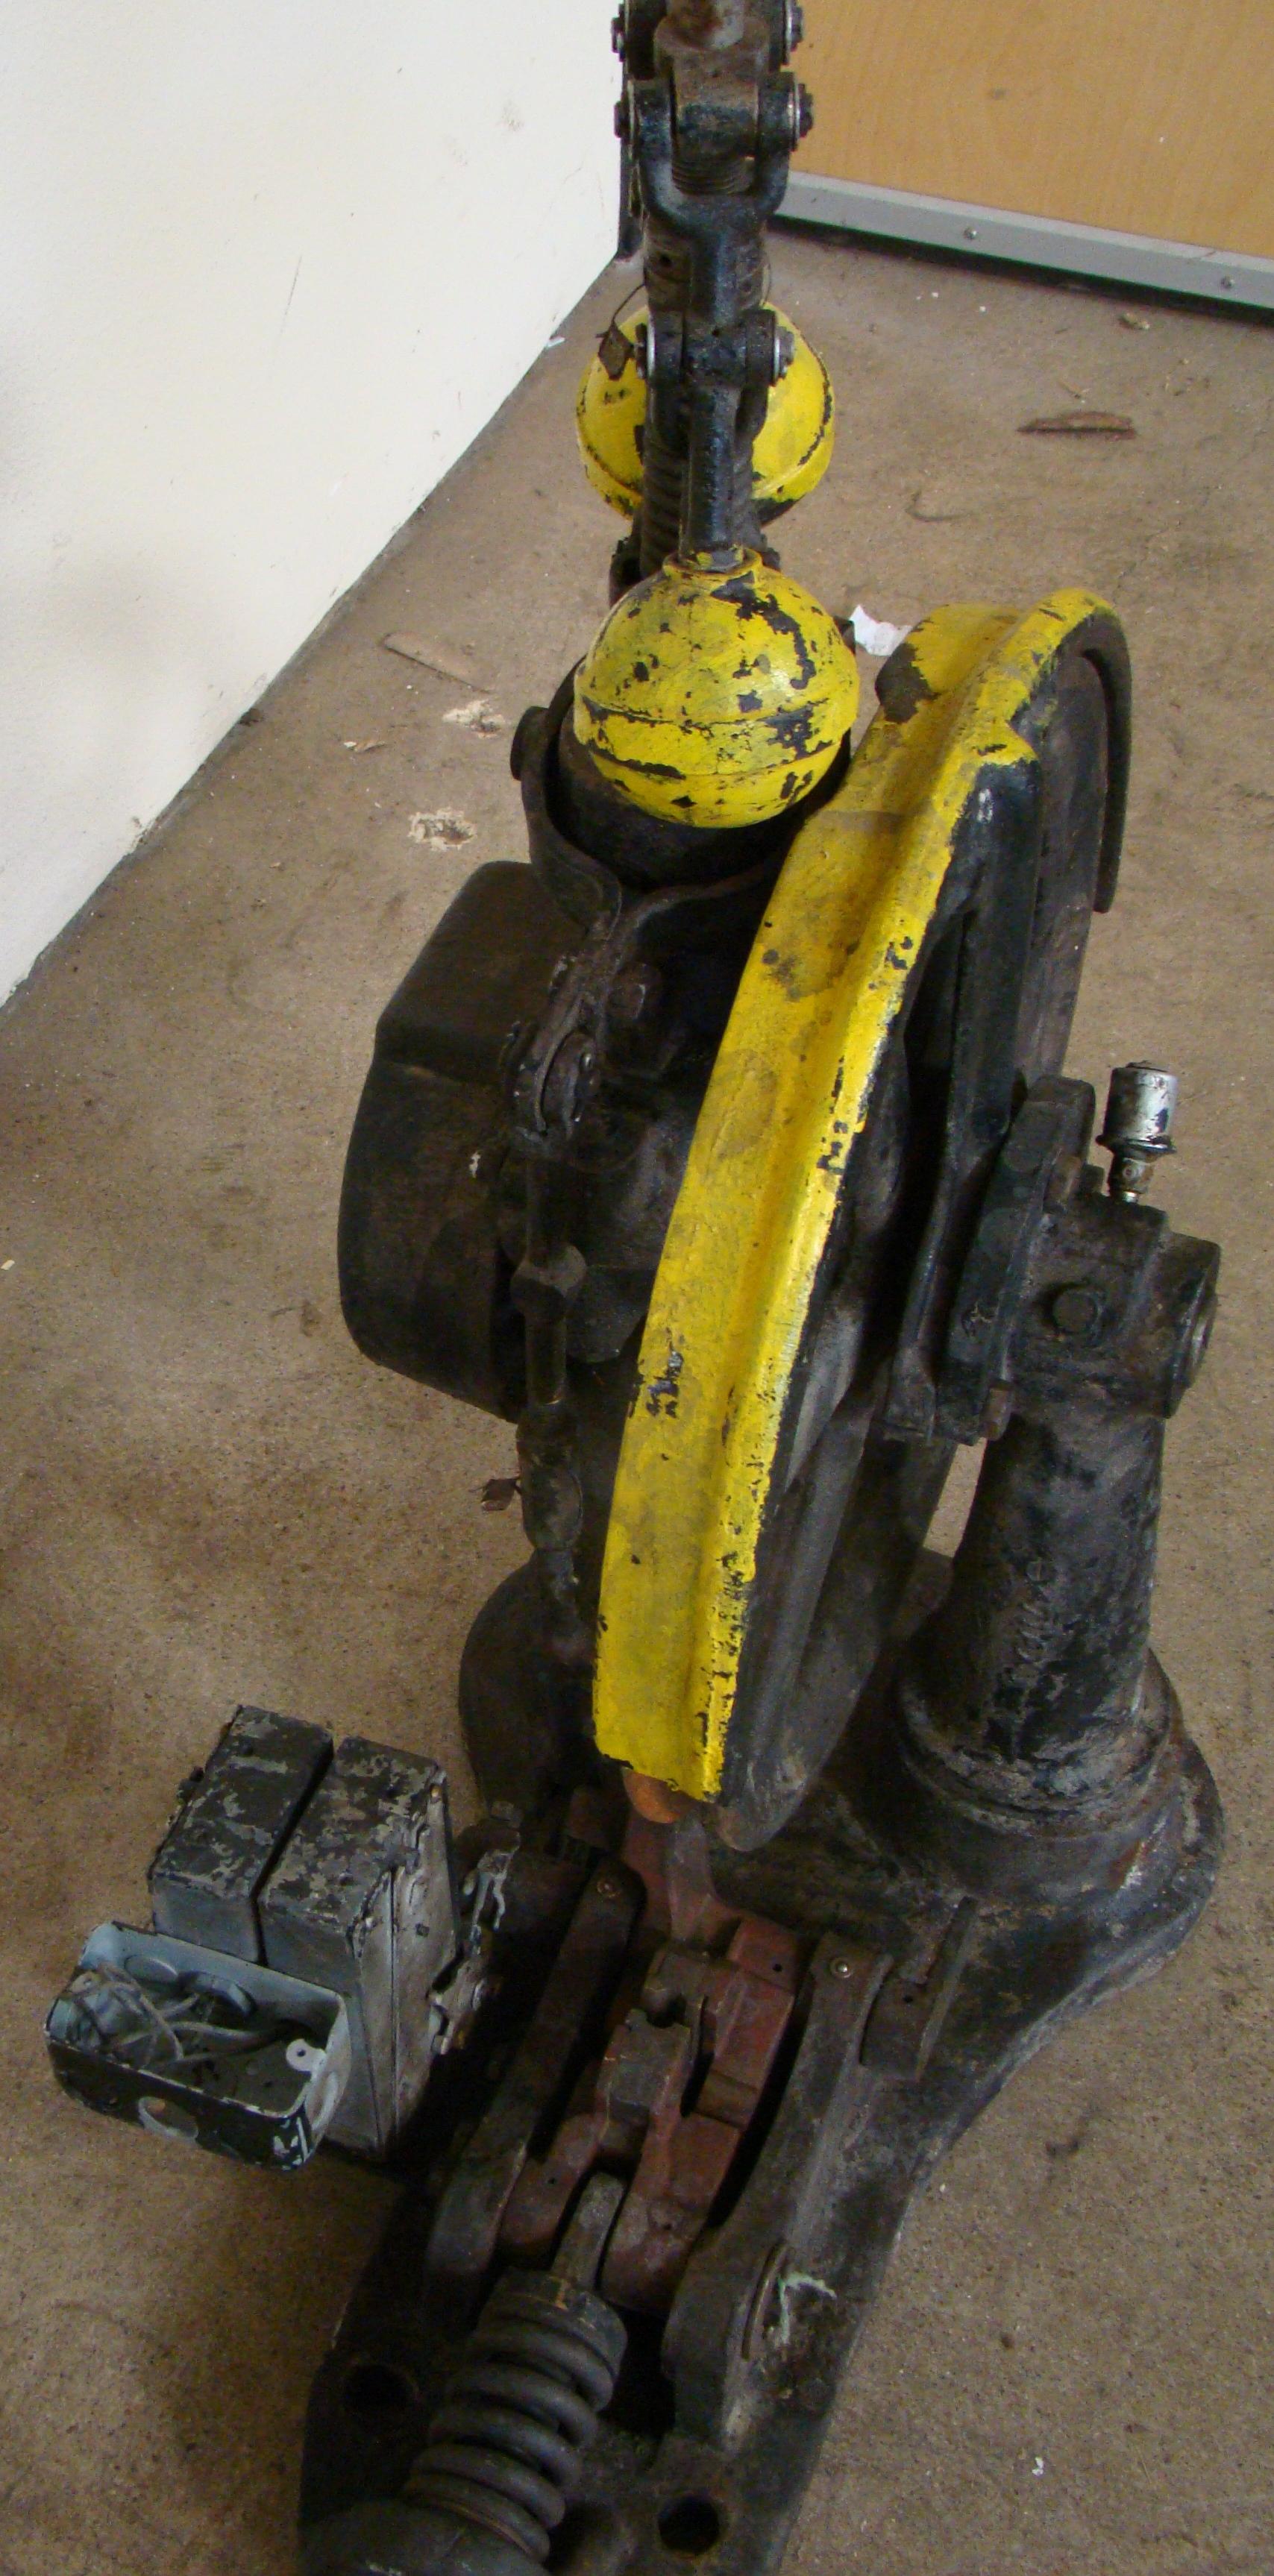 Antique Otis Elevator Safety Governor Brake, Cast Iron Brass Steampunk Carspeed, 700 FPM - Image 4 of 5